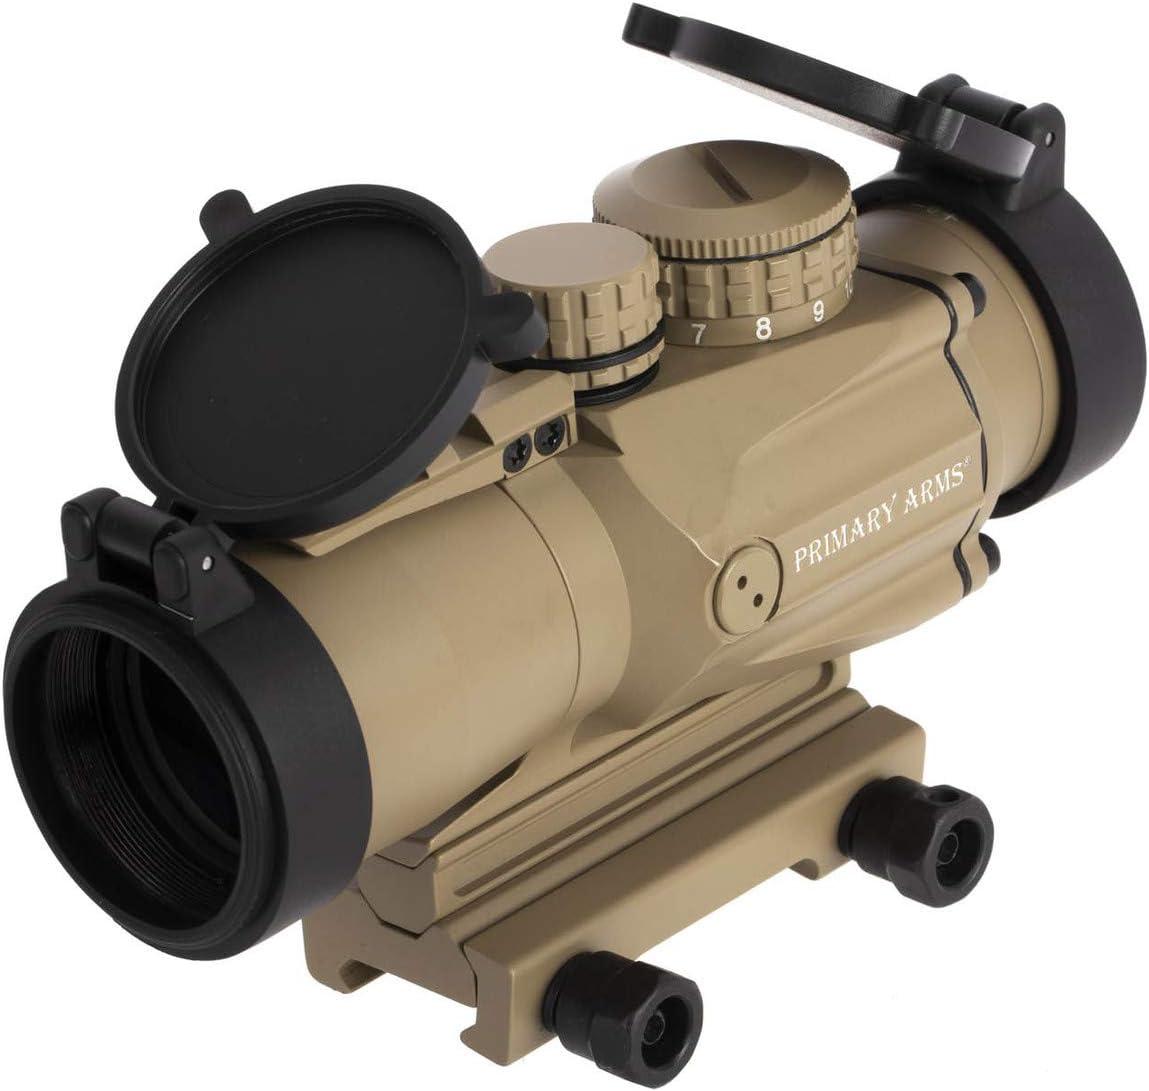 Primary Arms SLxP3 Compact 3×32 Gen II Prism Scope – ACSS-5.56-CQB-M2 – FDE